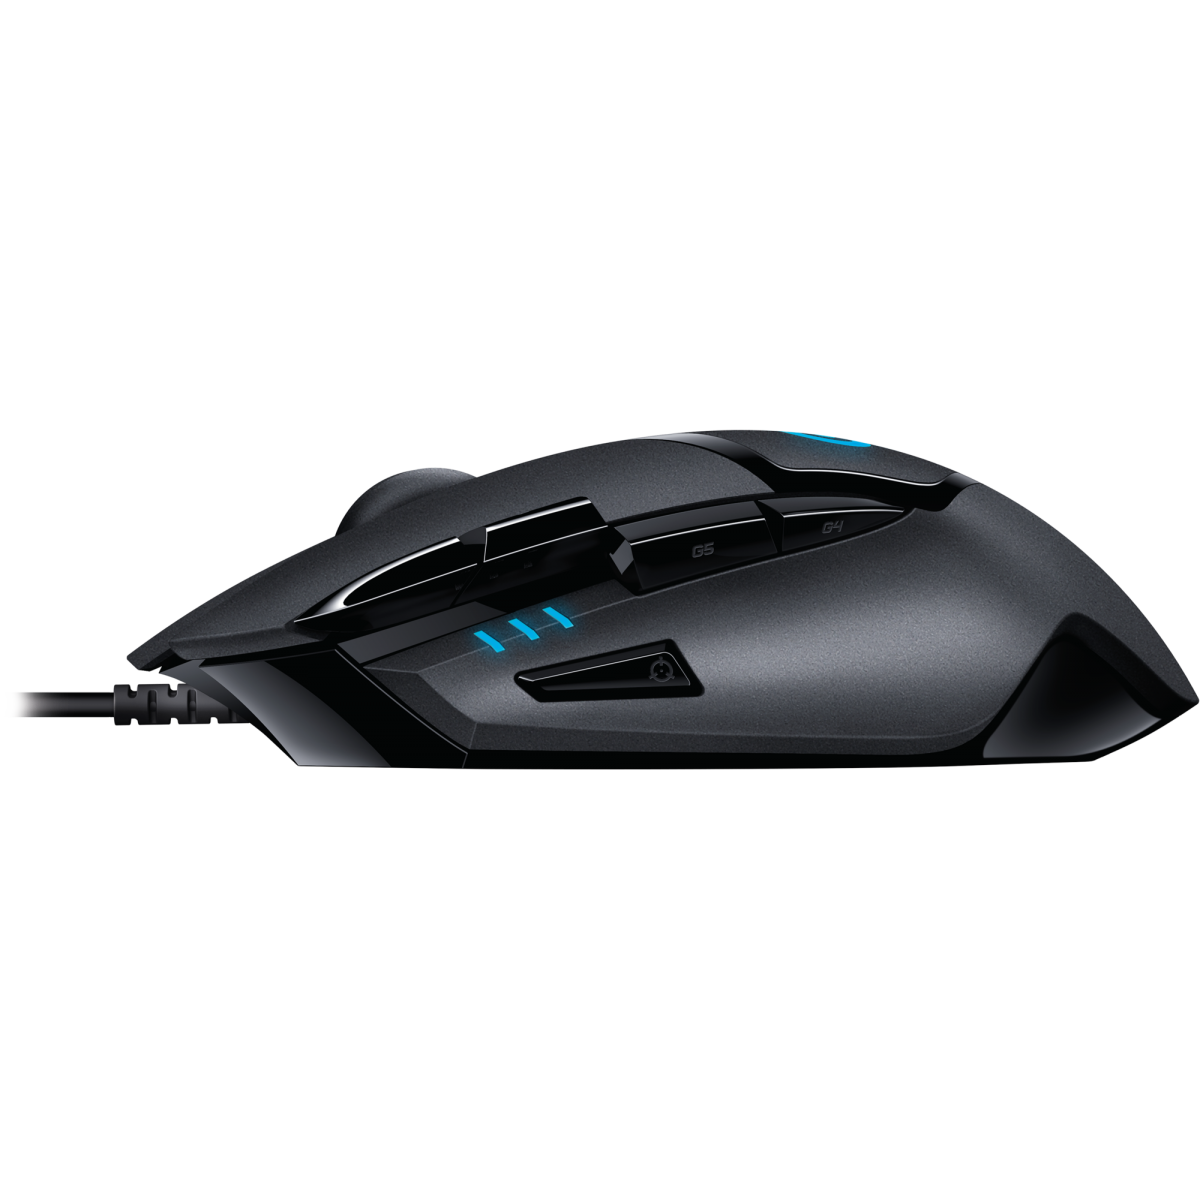 0336296ec7b Logitech G402 Hyperion Fury FPS Gaming Mouse | HX-MC004B | City Center For  Computers | Amman Jordan